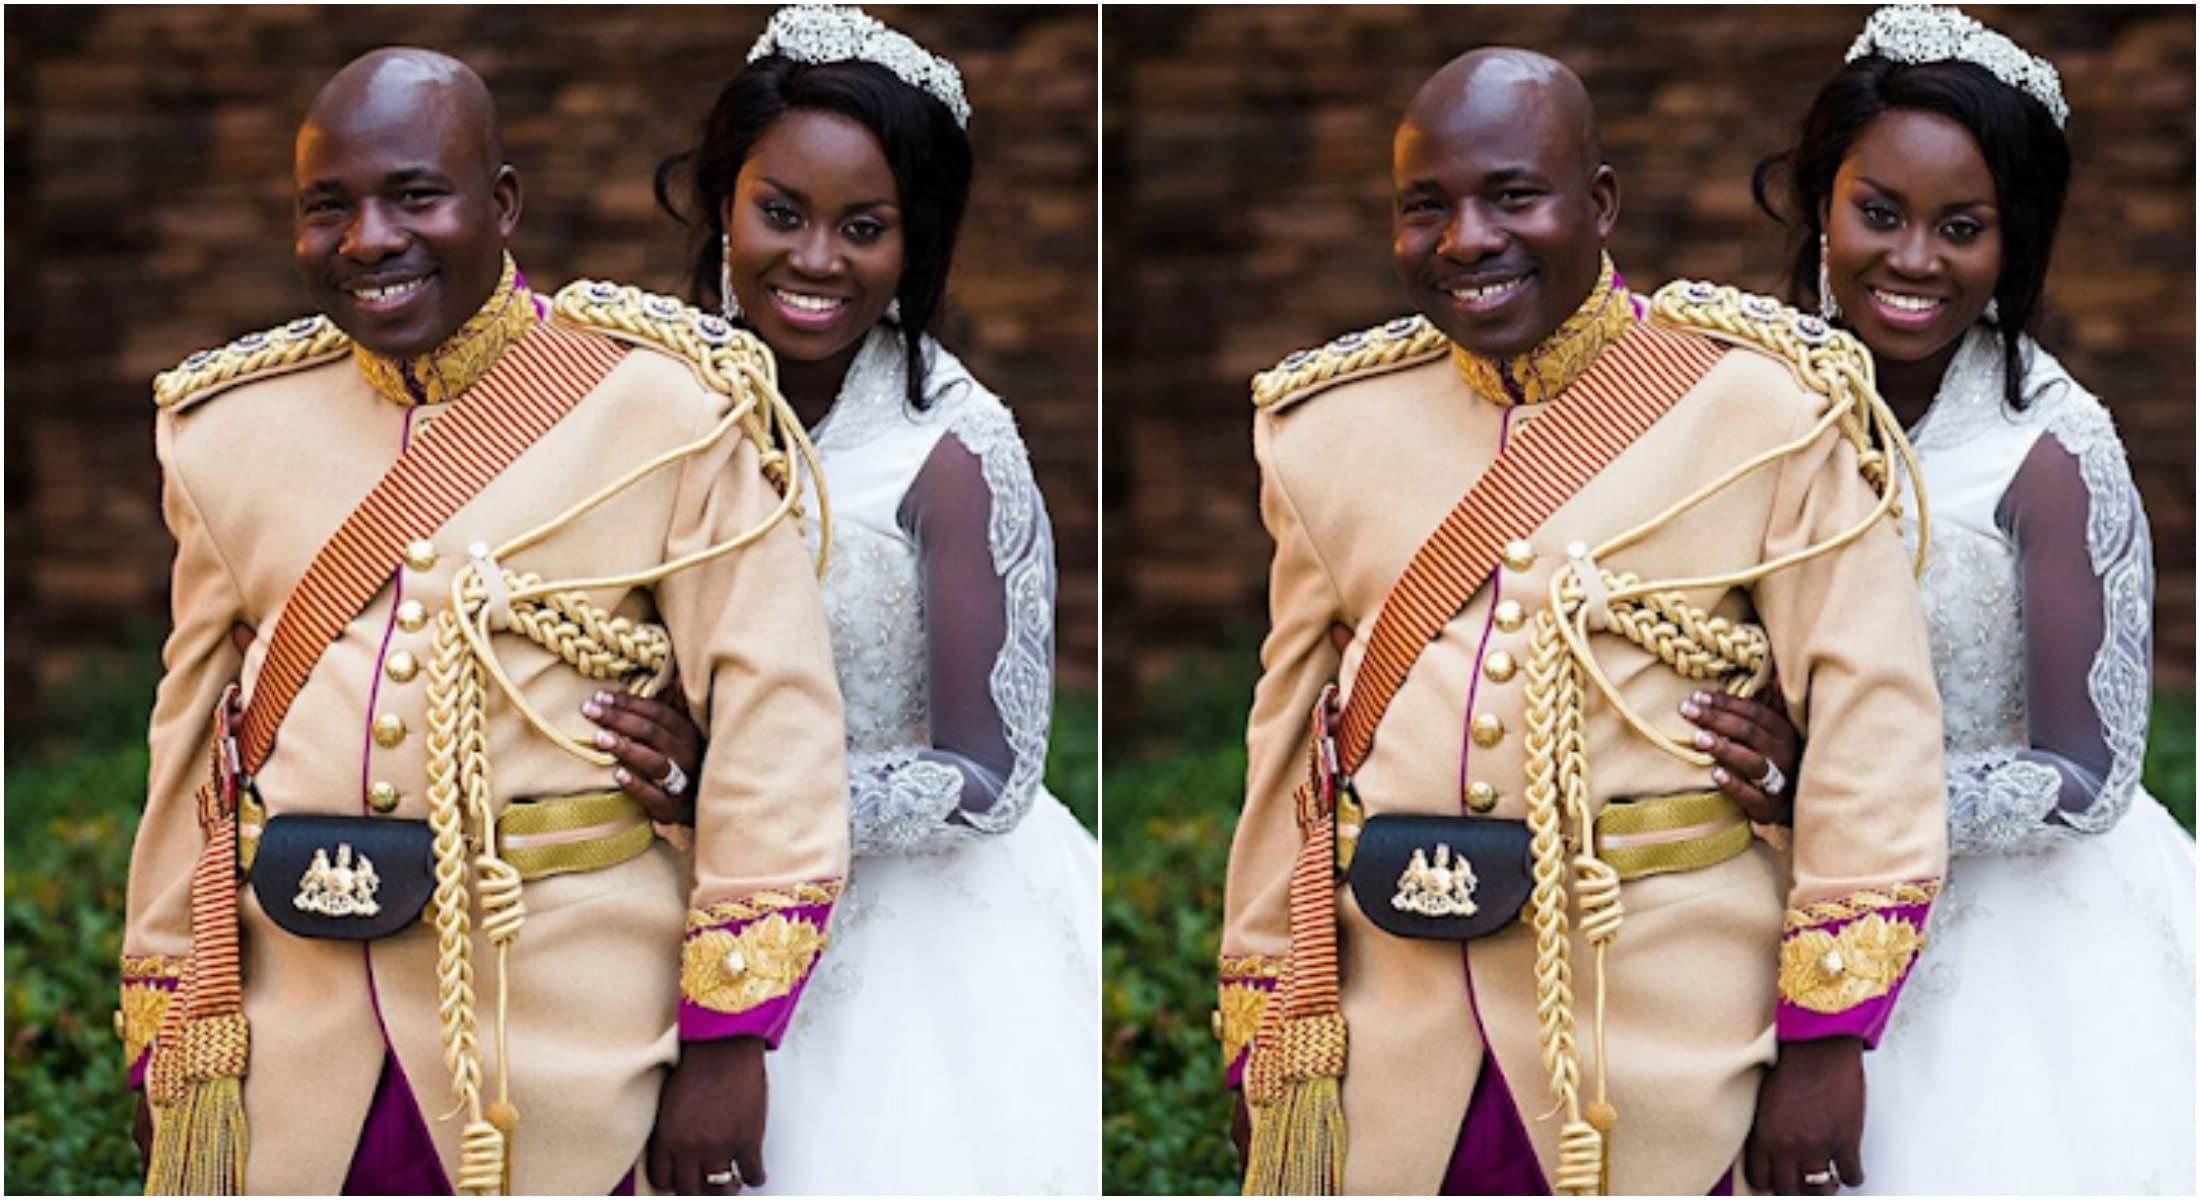 Apostle and First Lady Oluwajoba's wedding